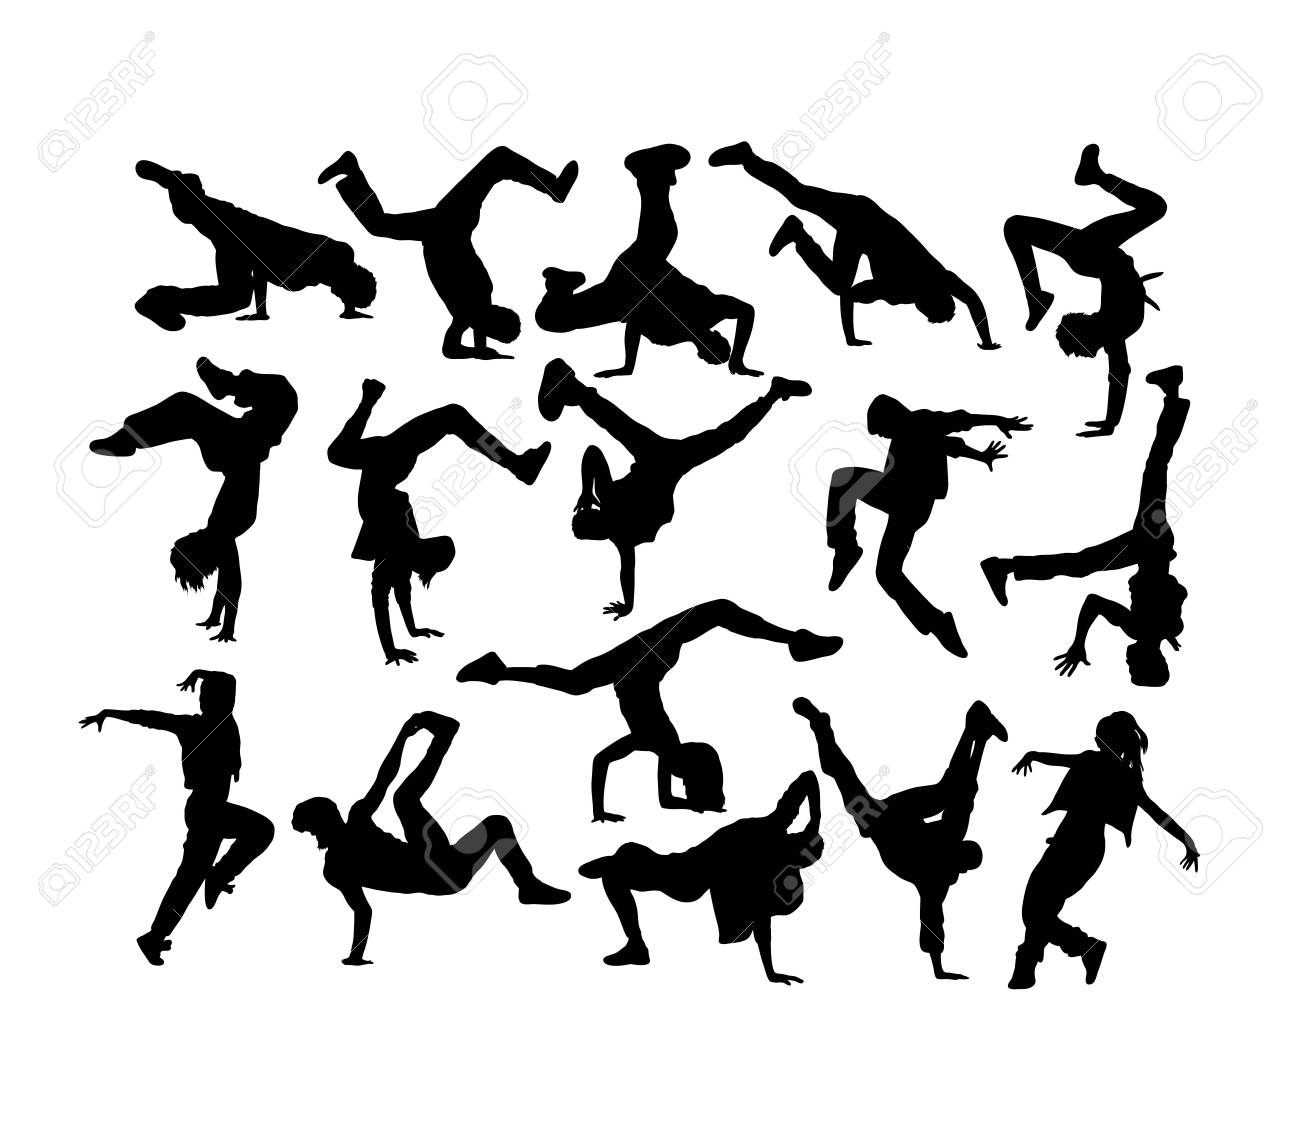 Happy Dancer Silhouettes, art vector design - 117470603